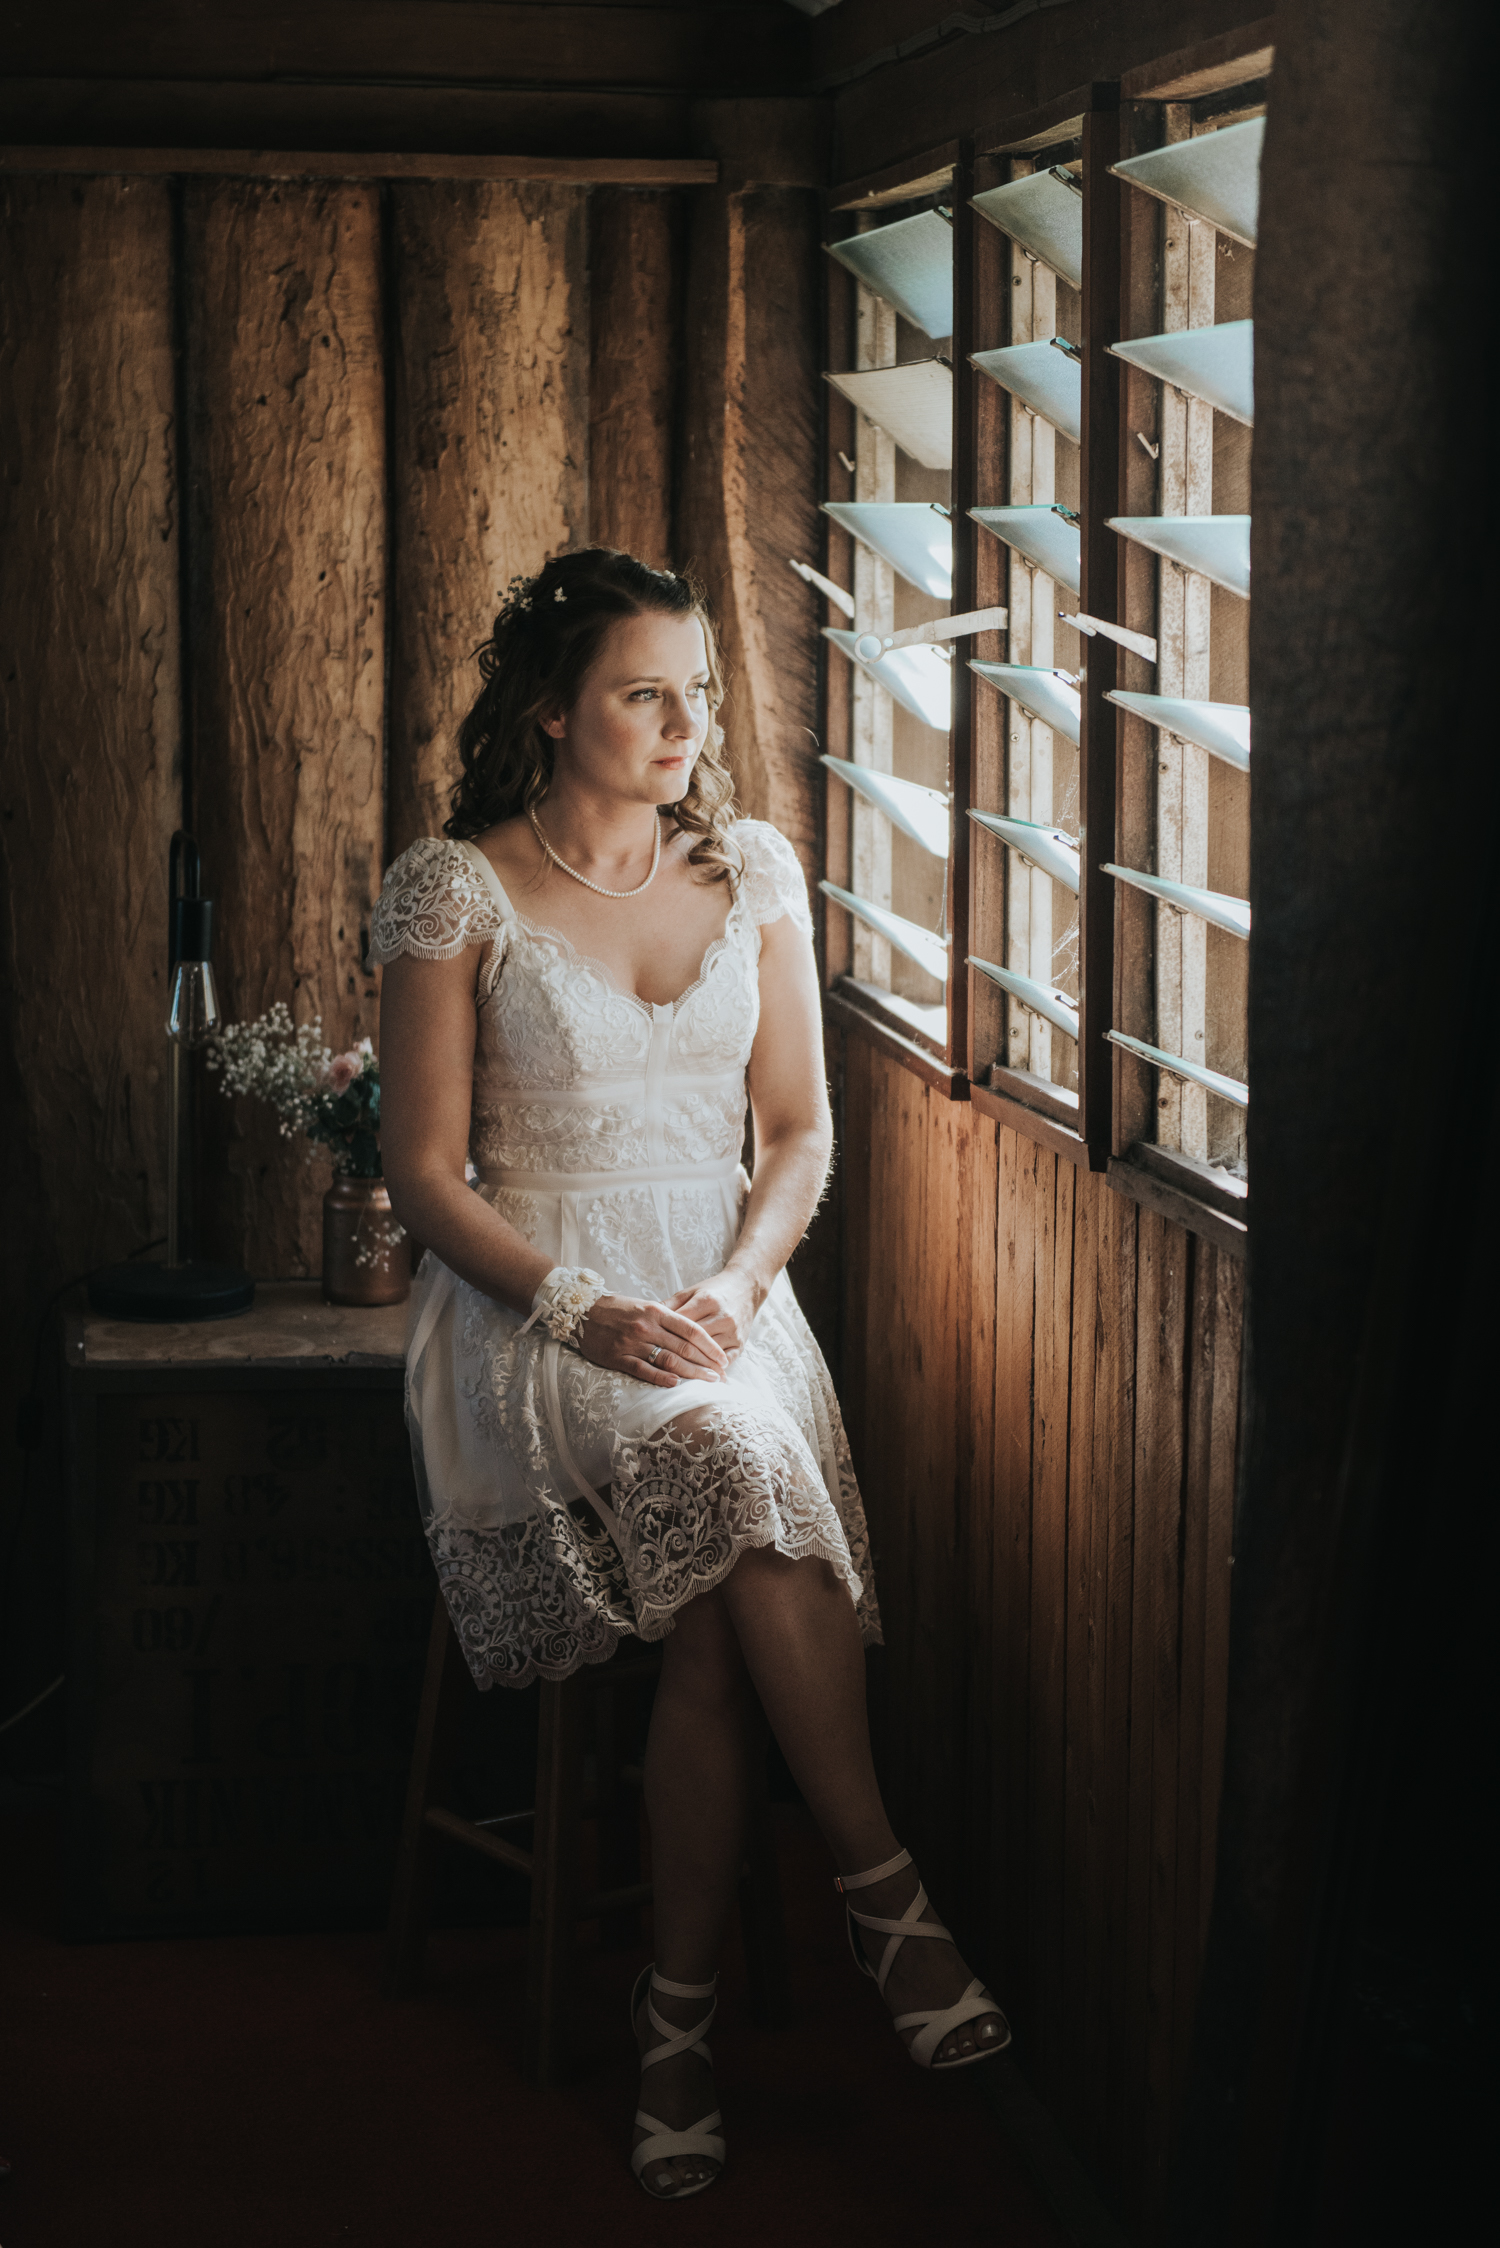 Brisbane Wedding Photographer | Engagement Photography-31.jpg